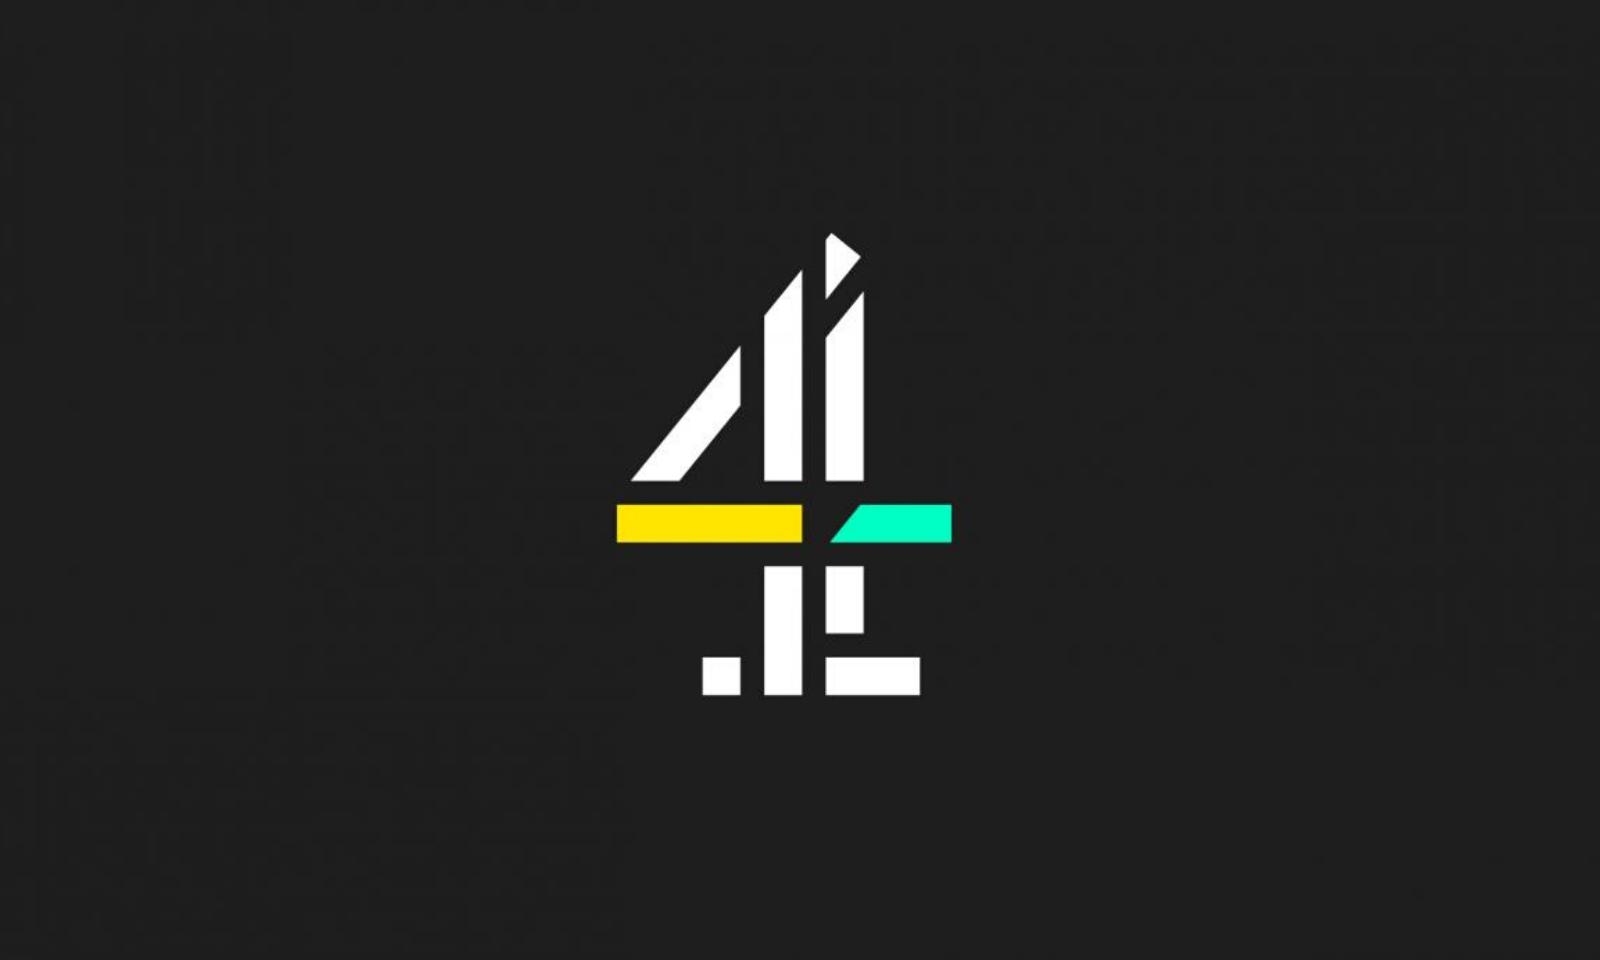 All 4 logo.